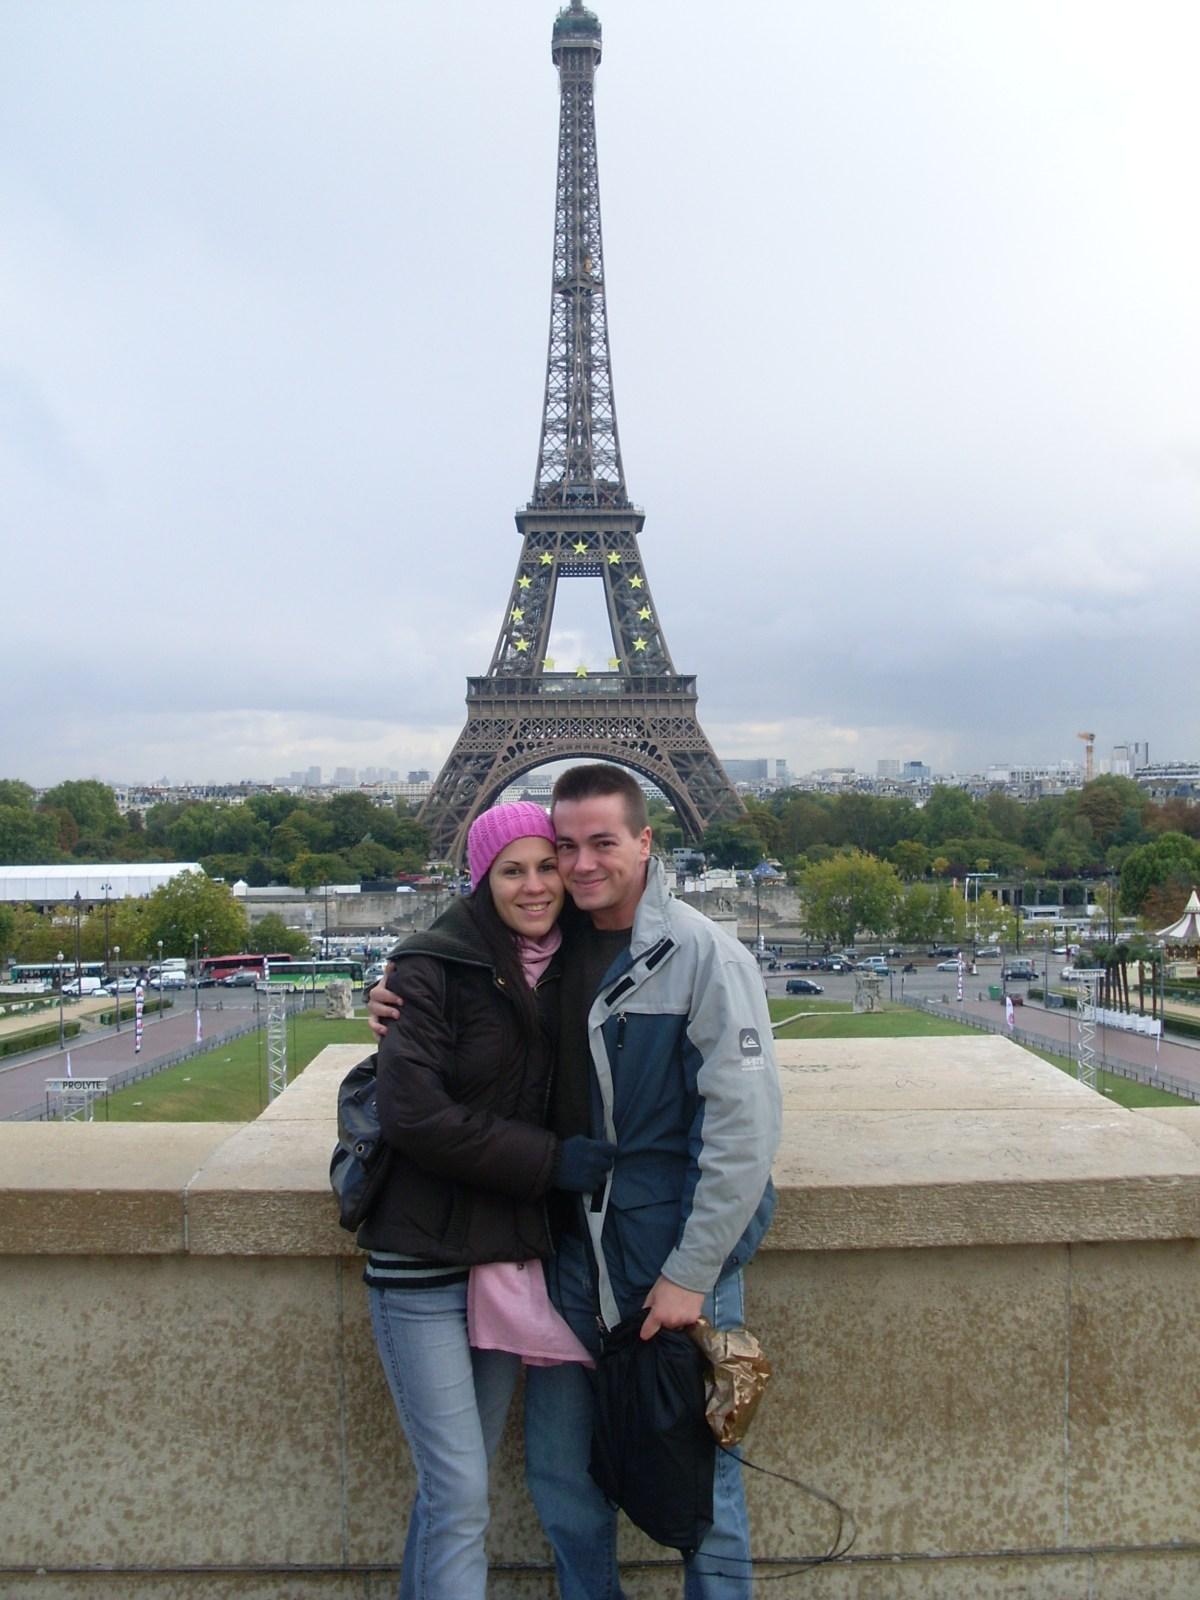 París – Octubre 2008: Itinerario de viaje 5 días